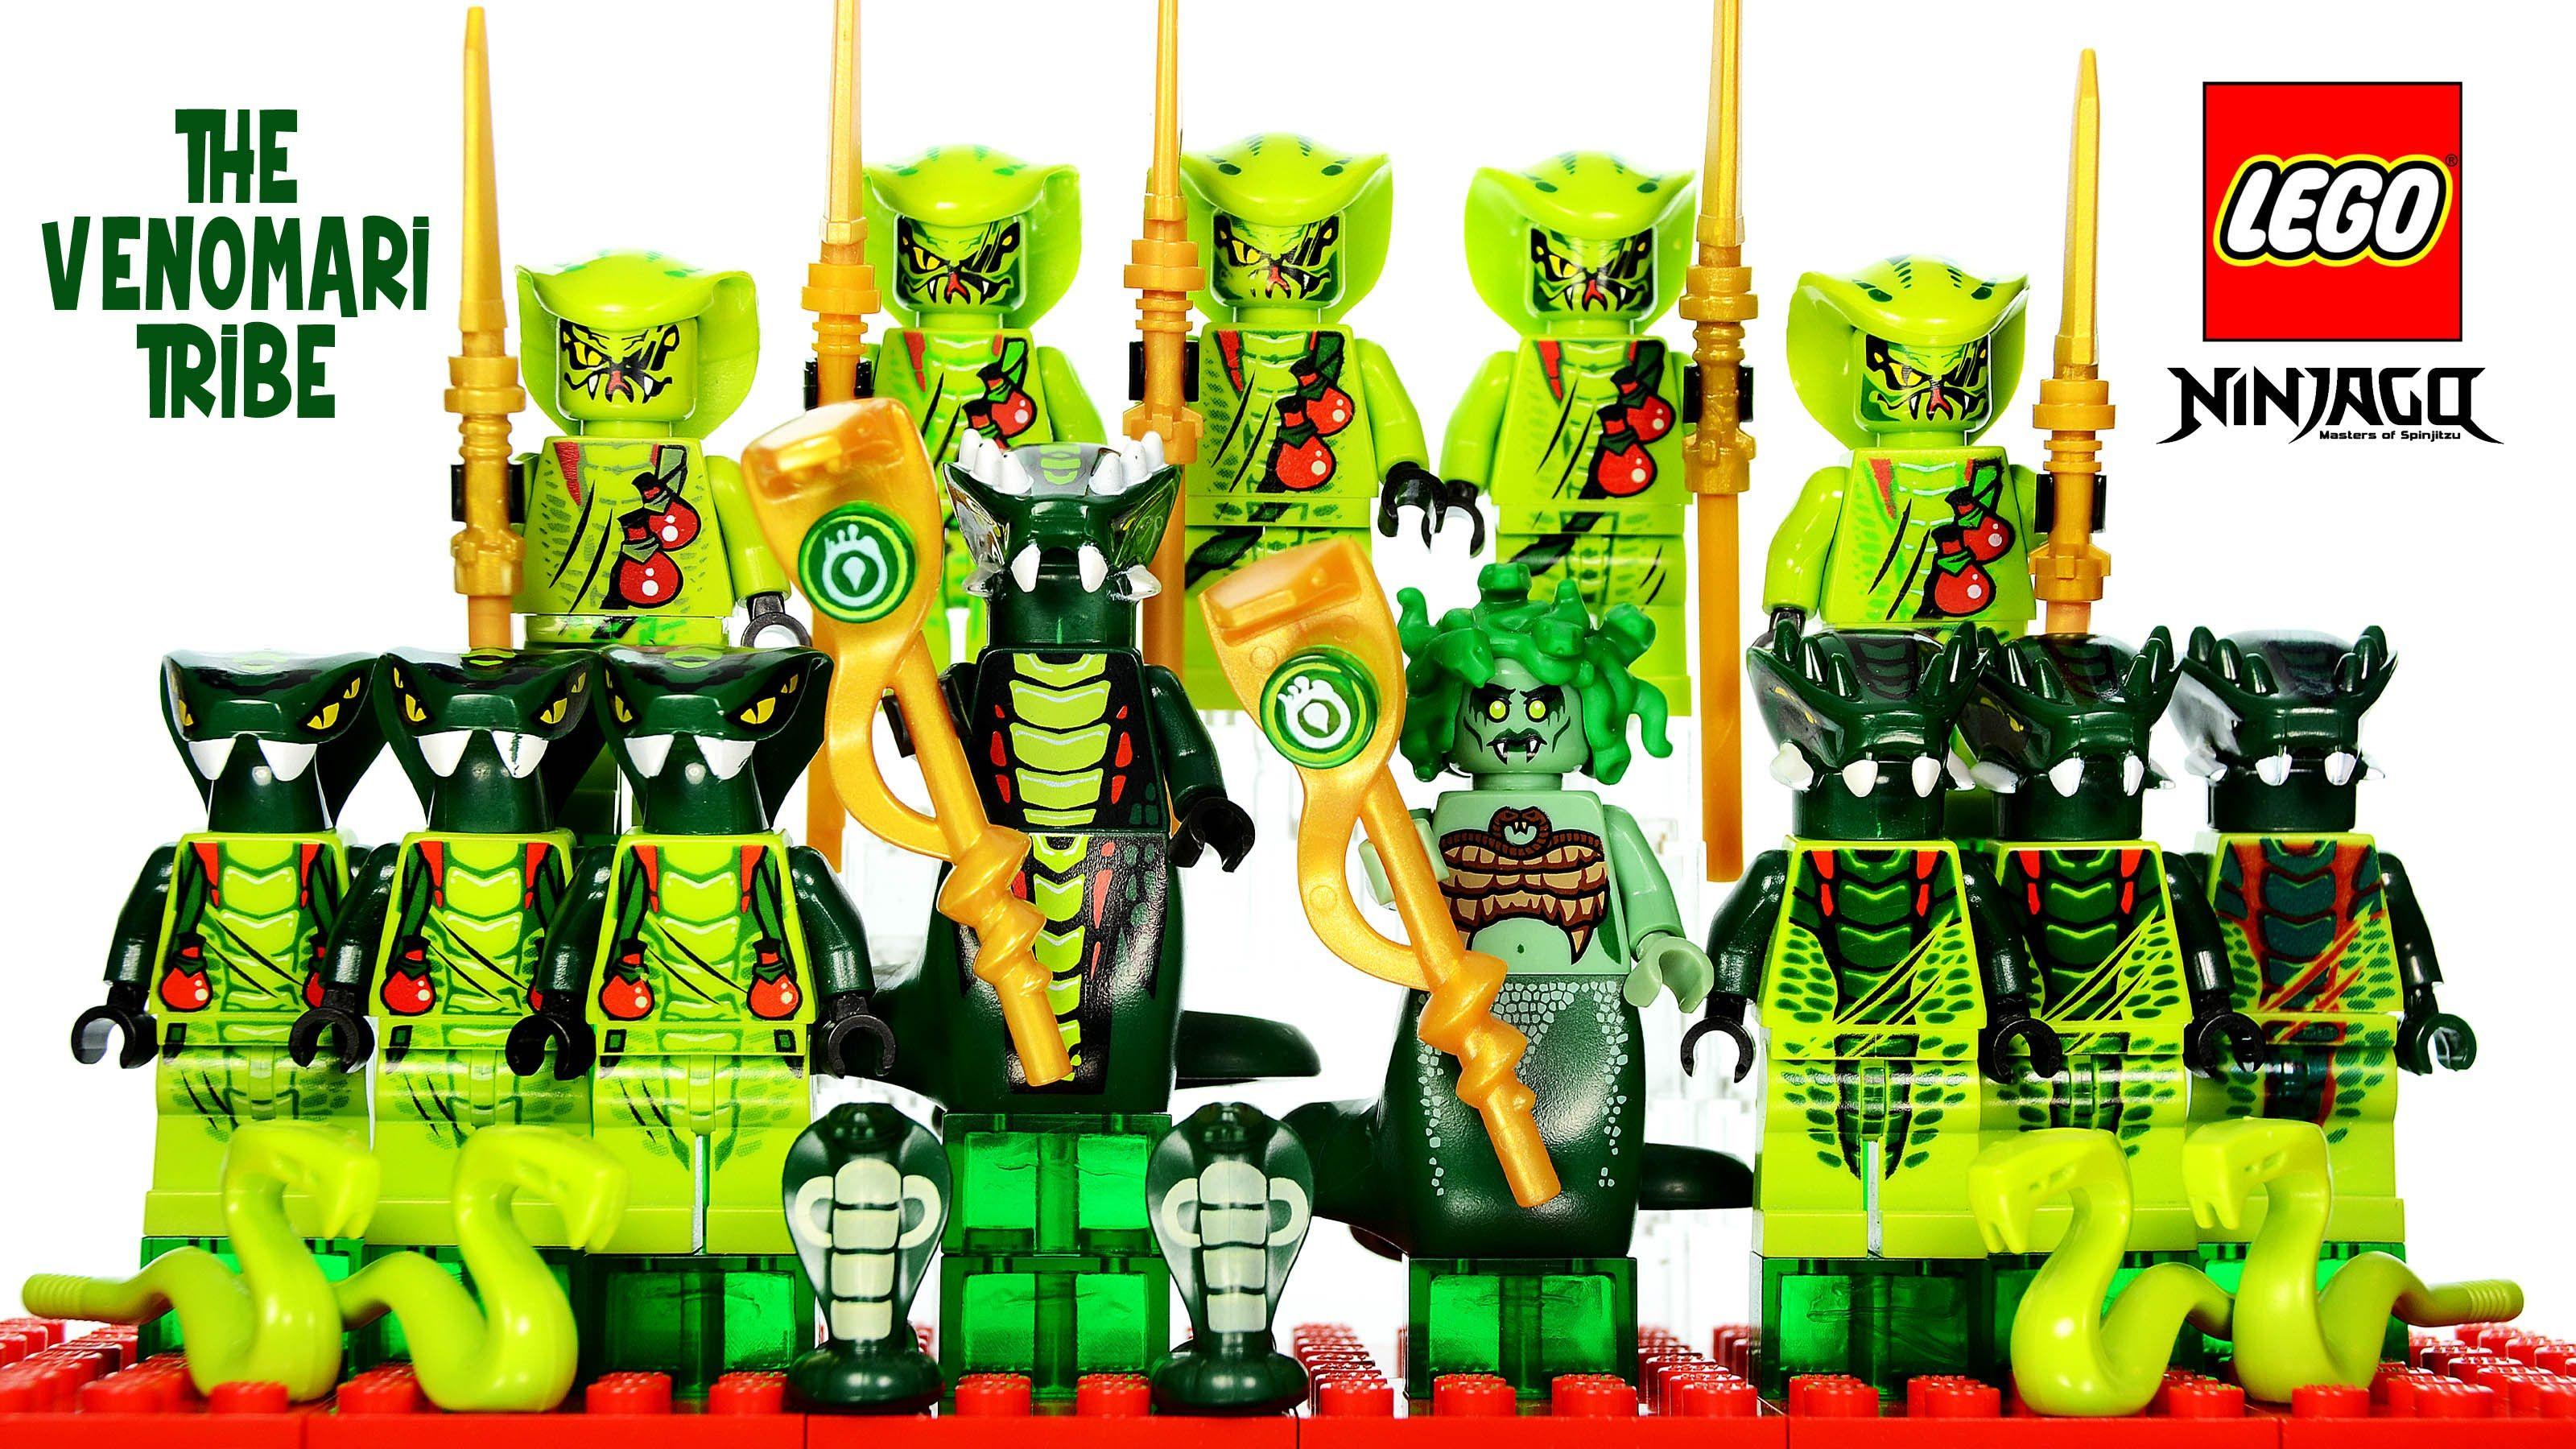 Lego Ninjago Rise Of The Snakes Venomari Tribe Serpentine Minifigure Collection Lego Ninjago Lego Cool Lego Creations